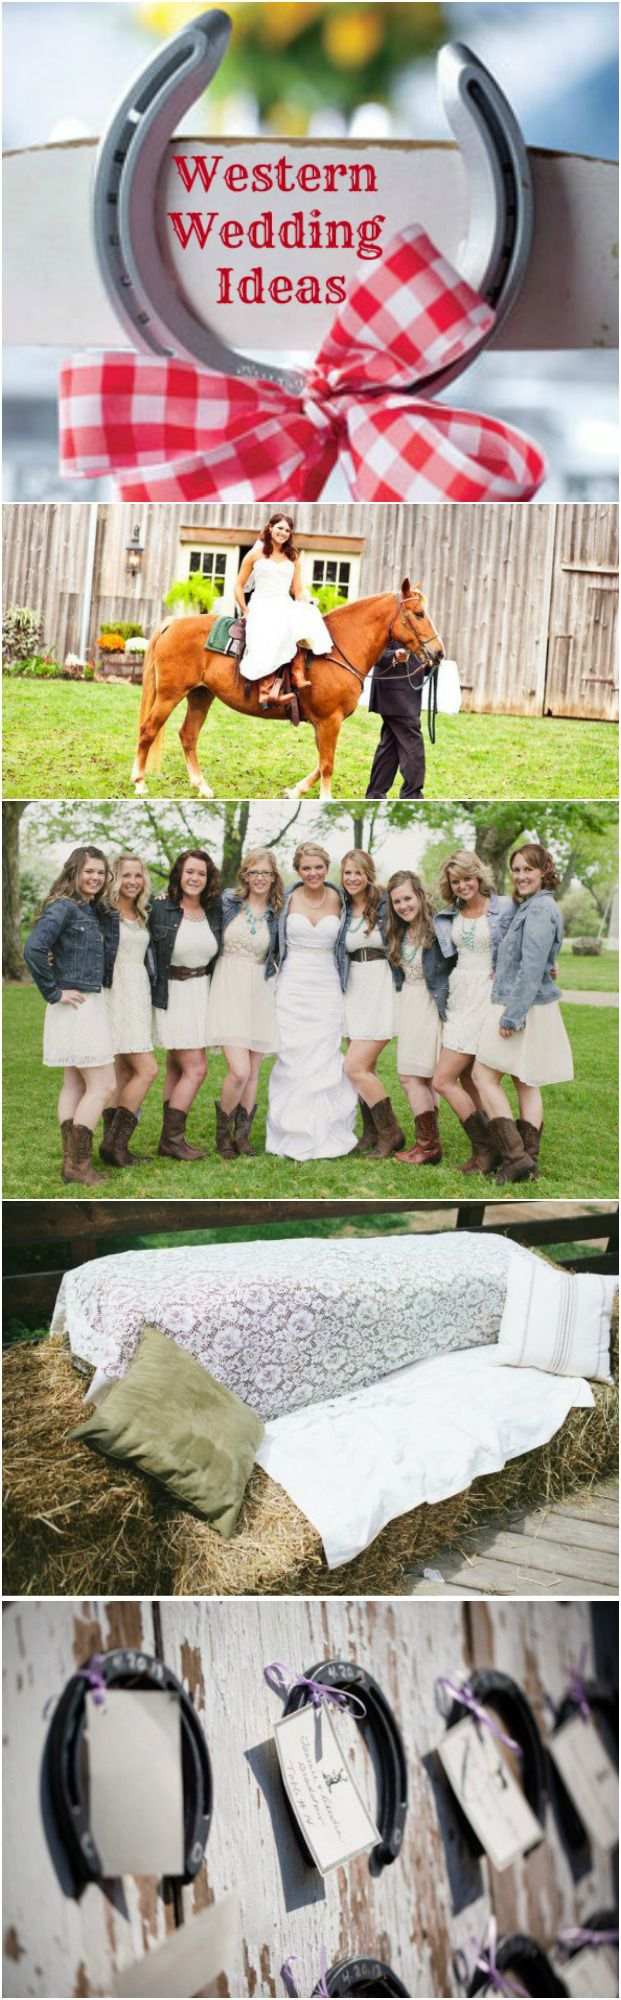 western country decor wedding ideas decorations